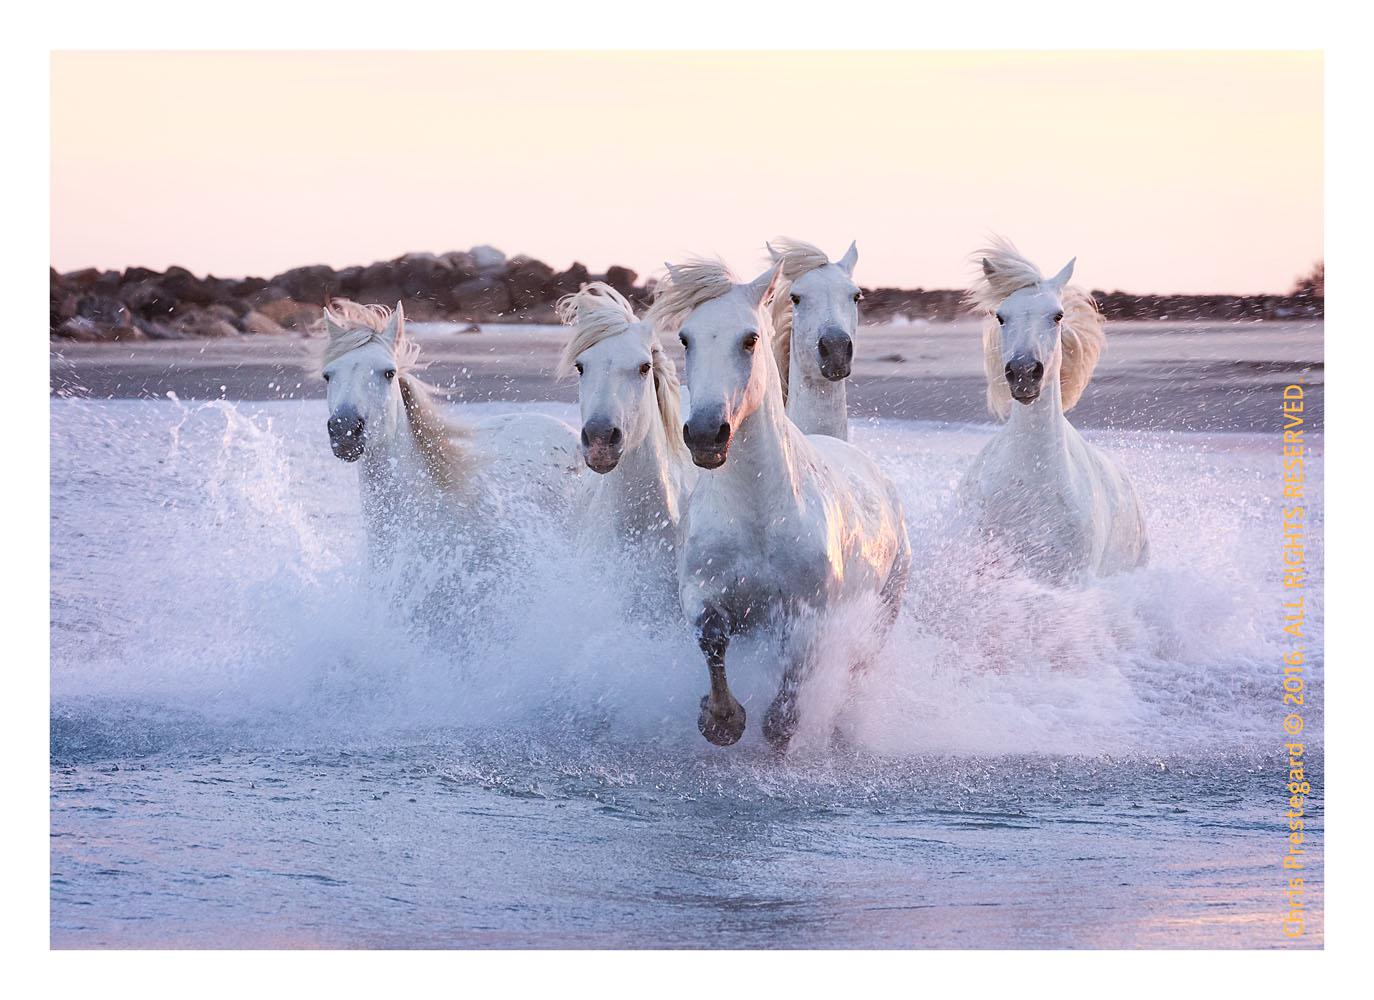 Camargue horses, Aigues Mortes, South of France, June 2016